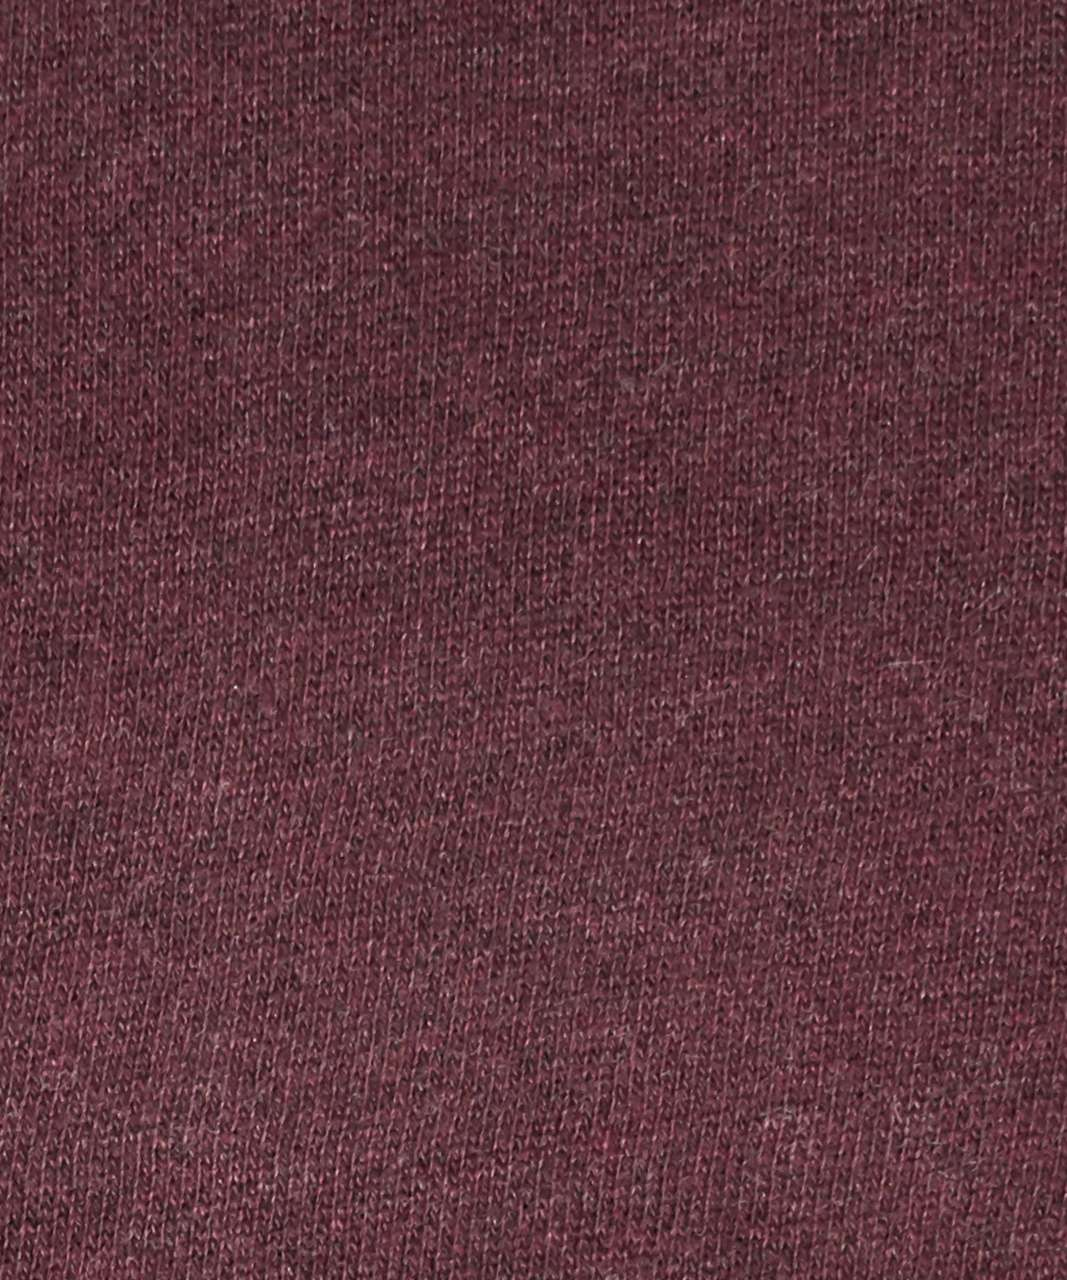 Lululemon Scuba Hoodie *Light Cotton Fleece - Heathered Cassis